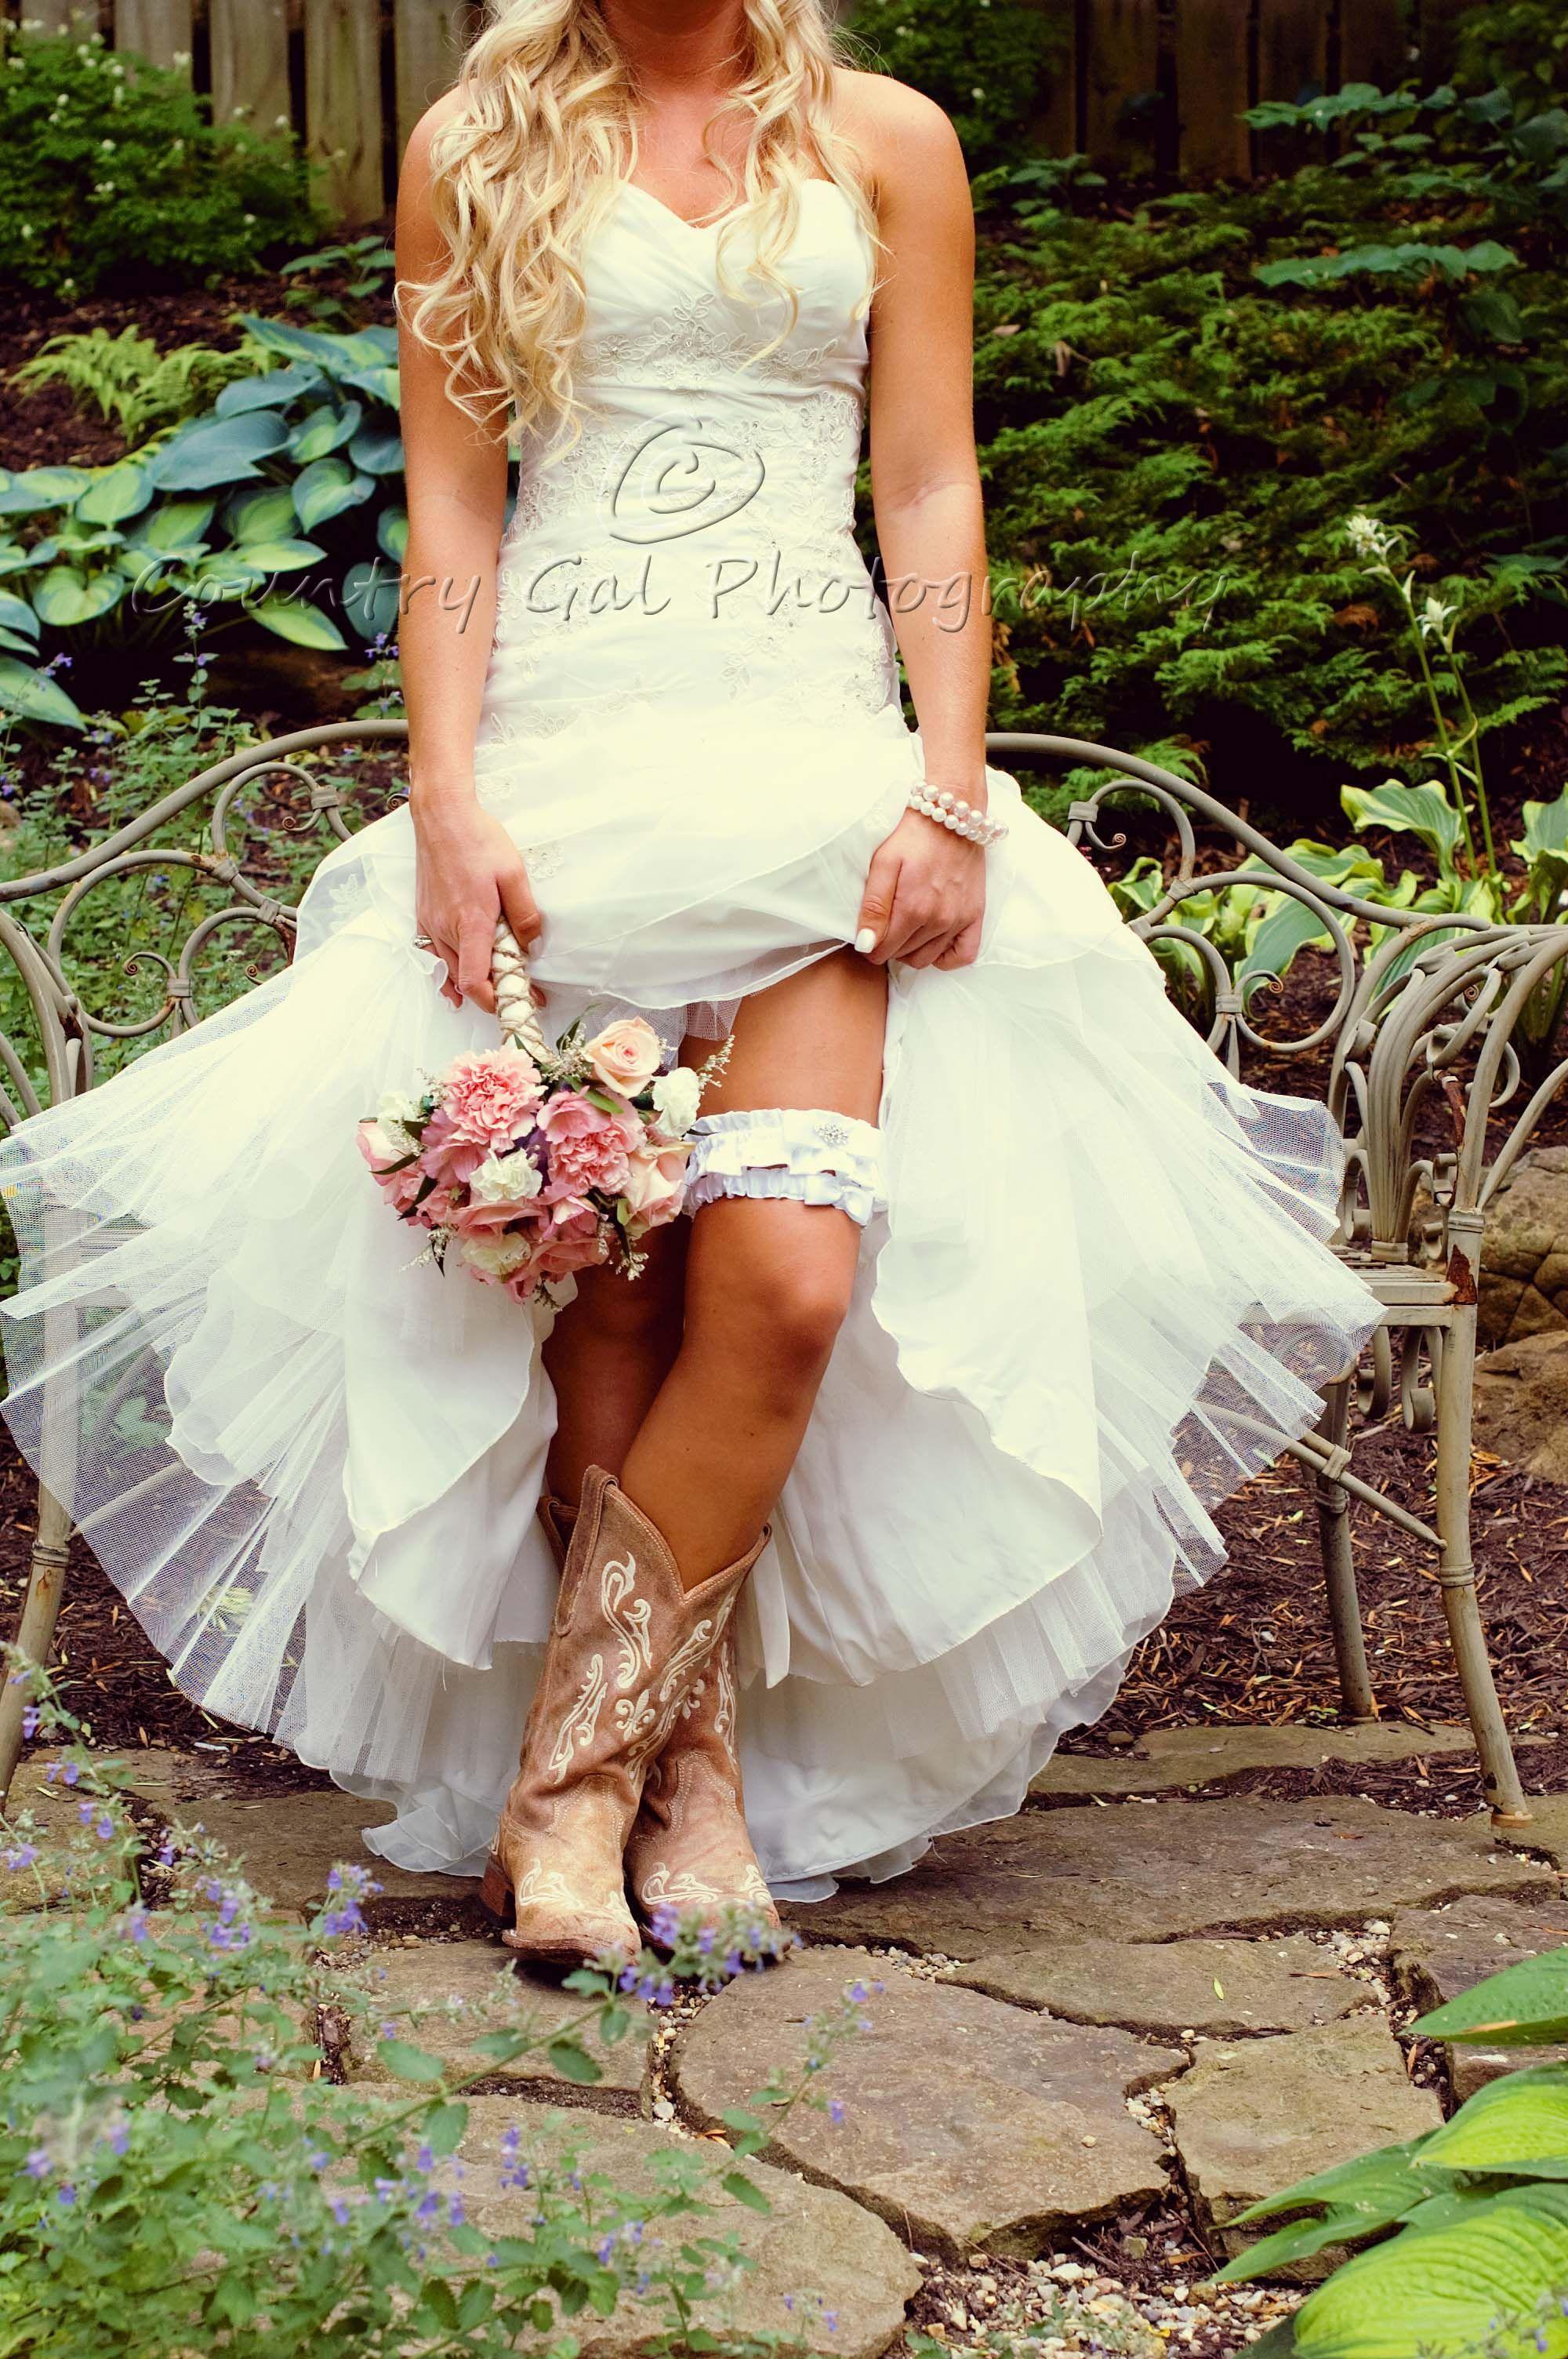 Bride country wedding wedding ideas for brides grooms parents